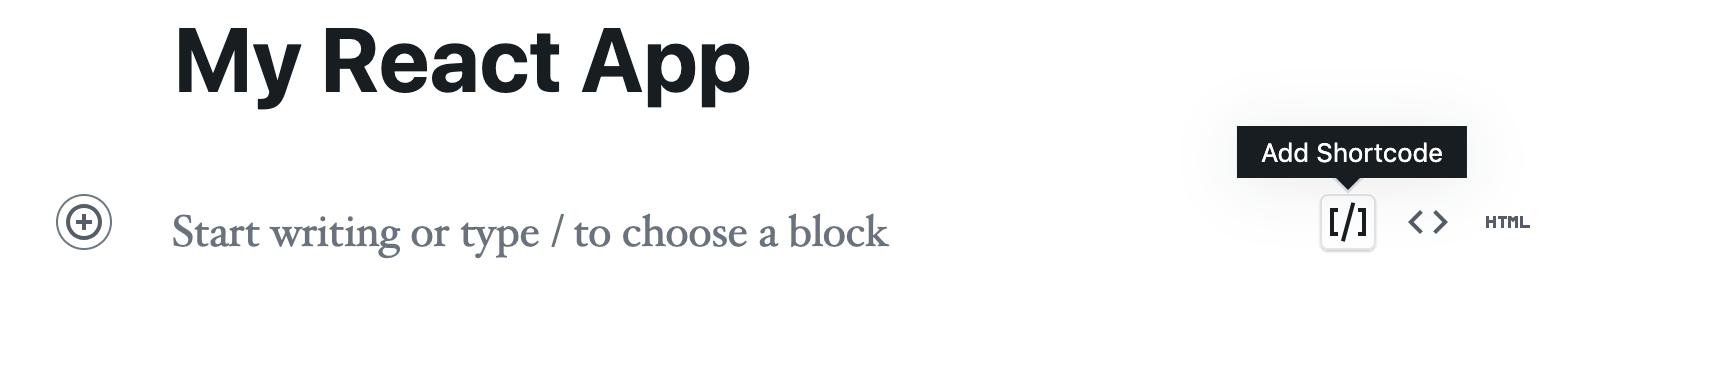 Adding a Shortcode Block